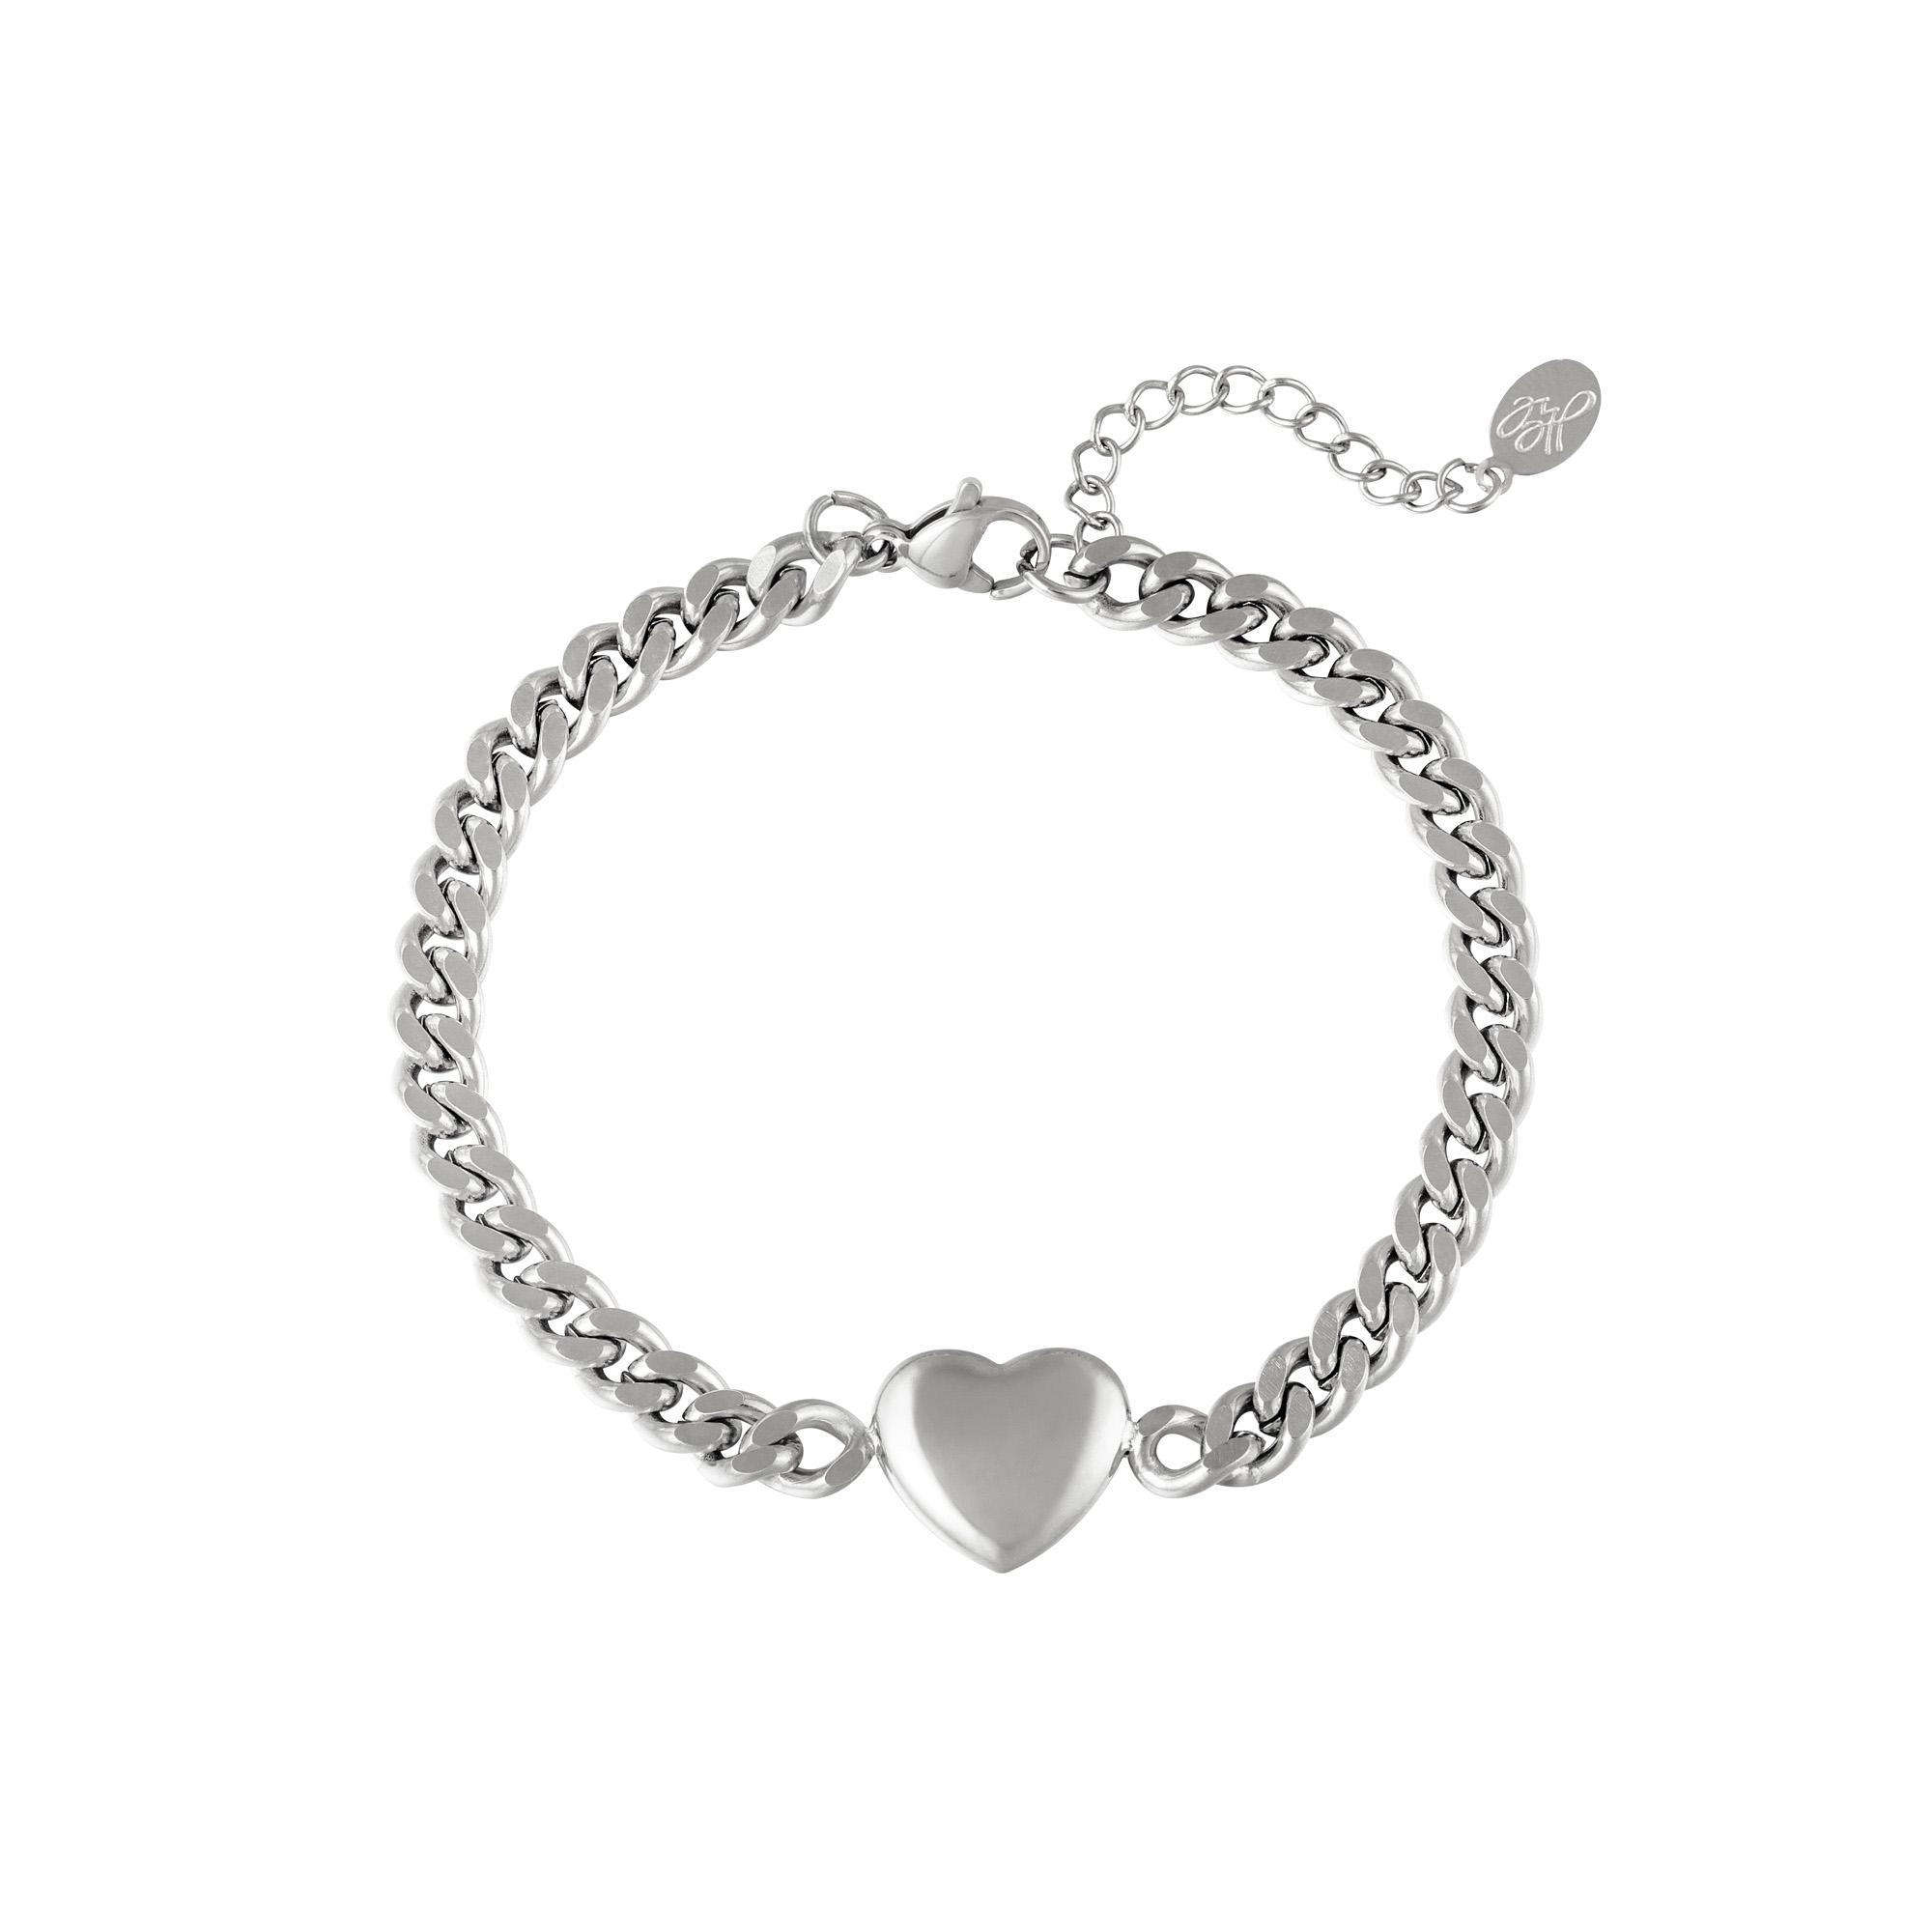 Armband Chained Heart